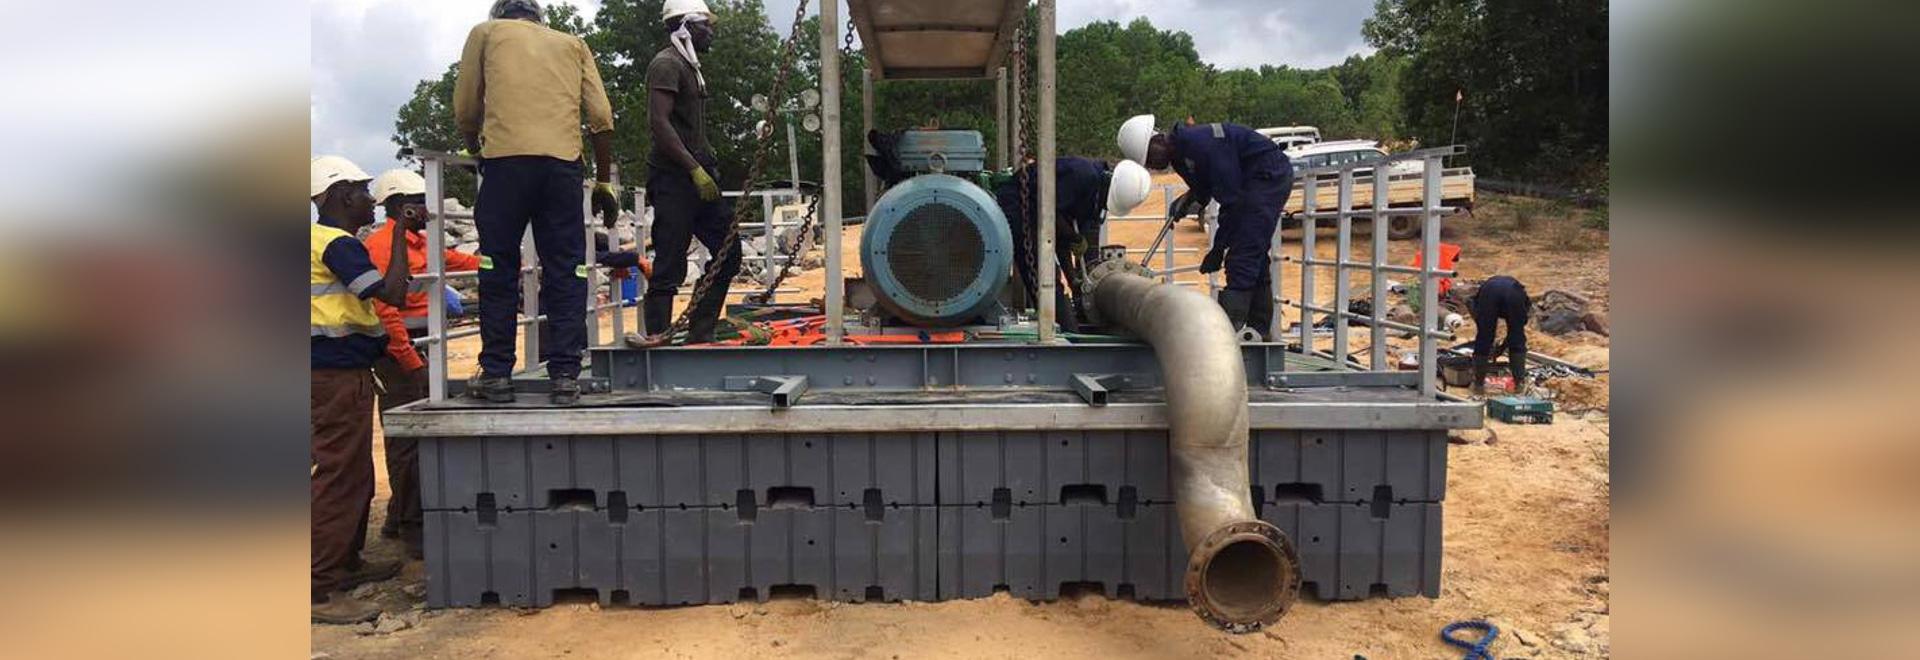 WATER TREATMENT IN GHANA ON WAP PONTOONS